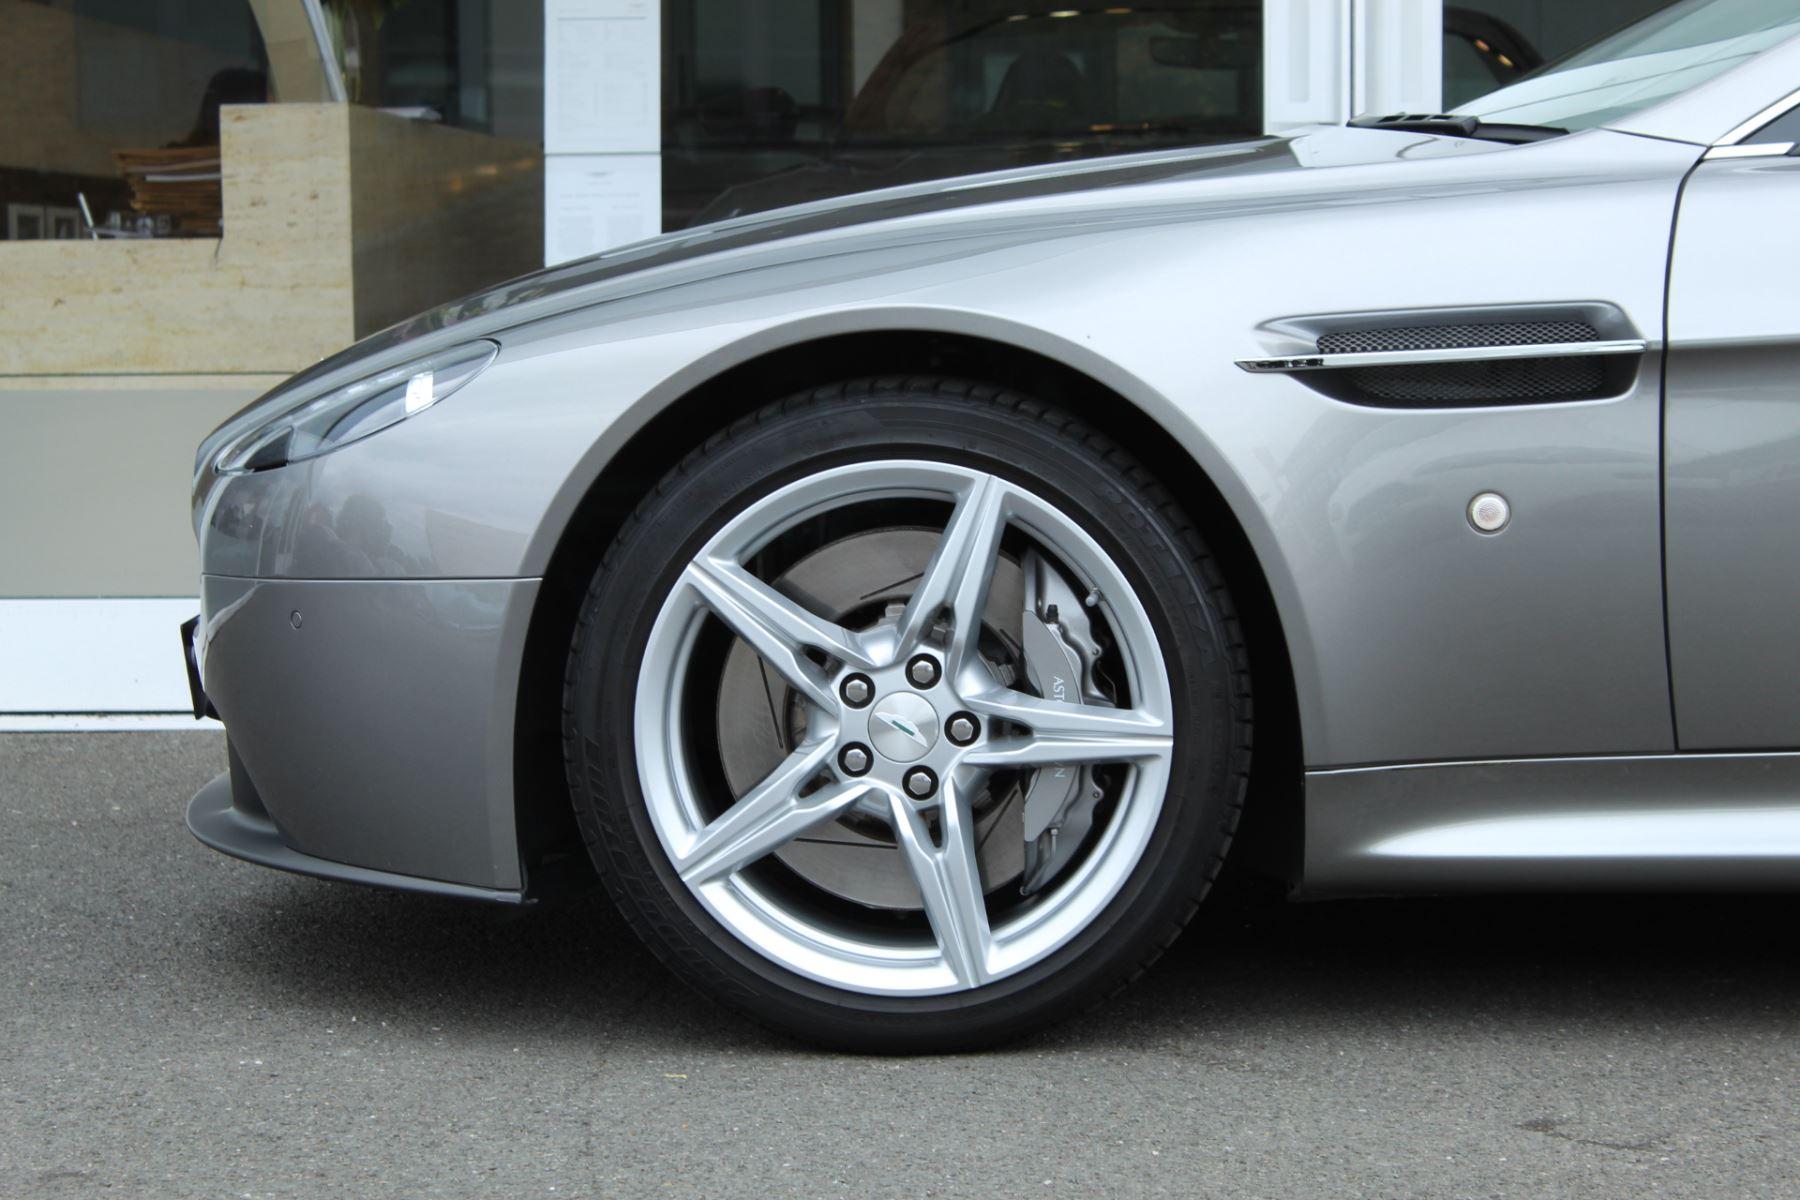 Aston Martin V8 Vantage Coupe 2dr Sportshift [420] image 16